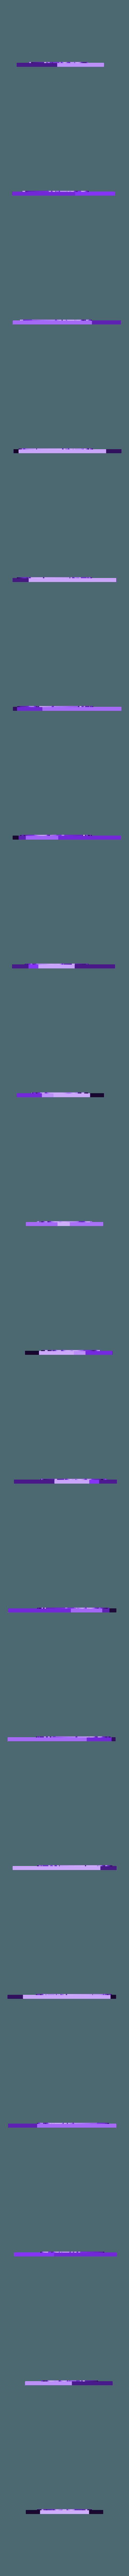 BLACK.stl Download free STL file Star-Lord Badge • 3D print object, 3Dimpact